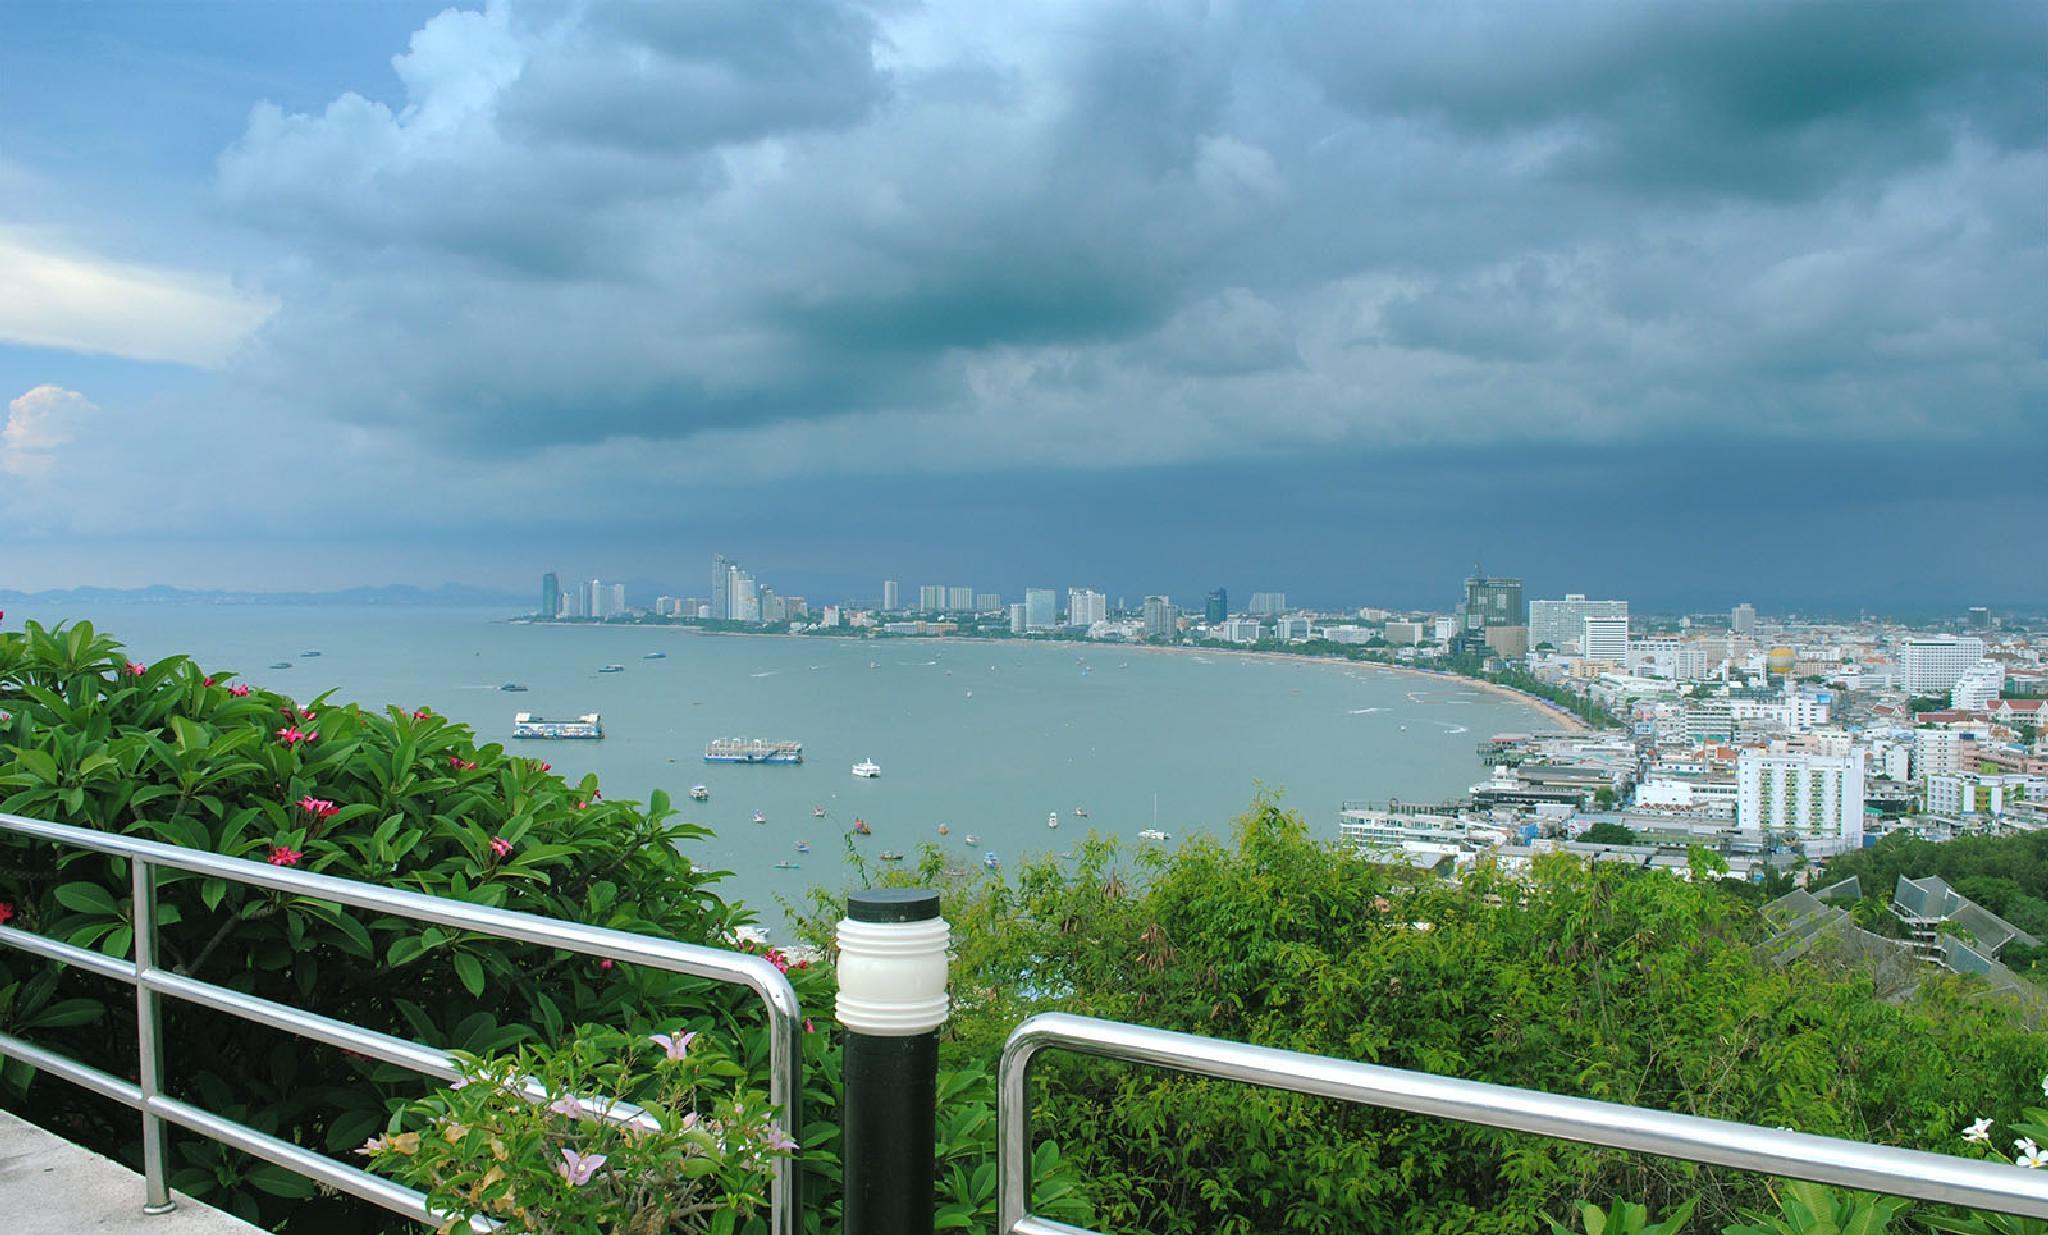 Pattaya Hill by lequangchi